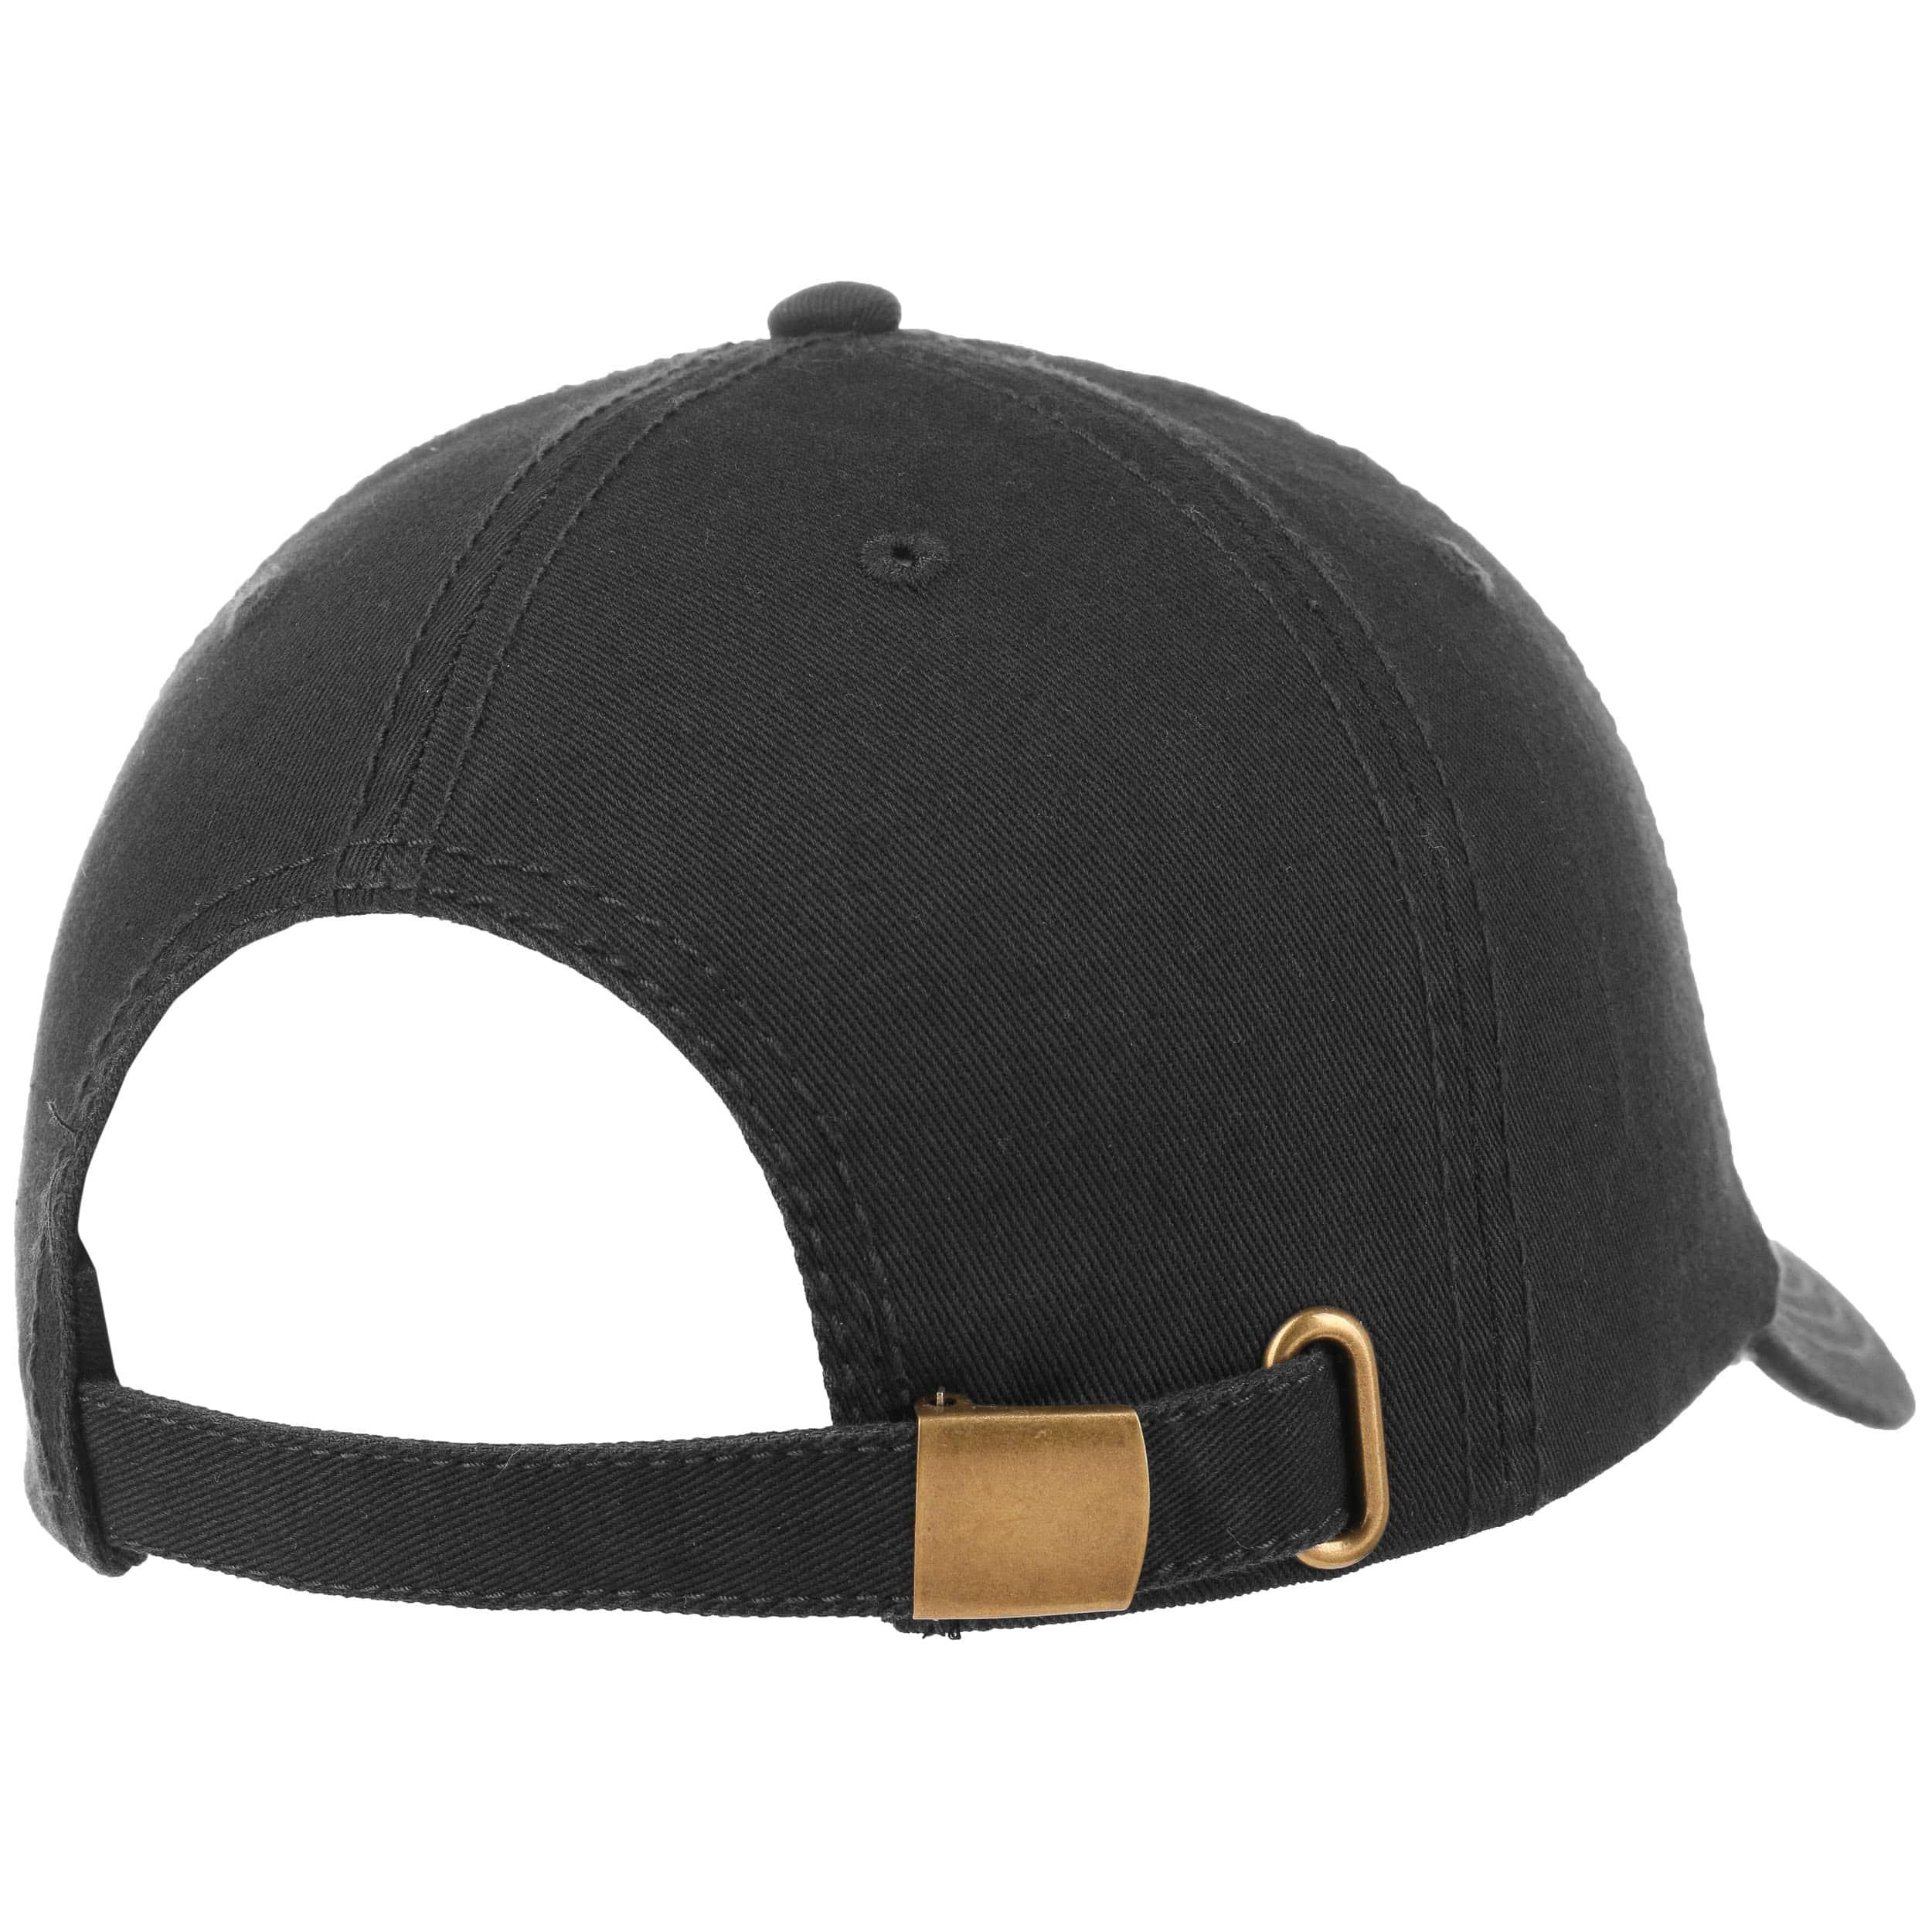 3f23a792 ... light grey 3 · Dad Hat Strapback Cap - black 3 ...